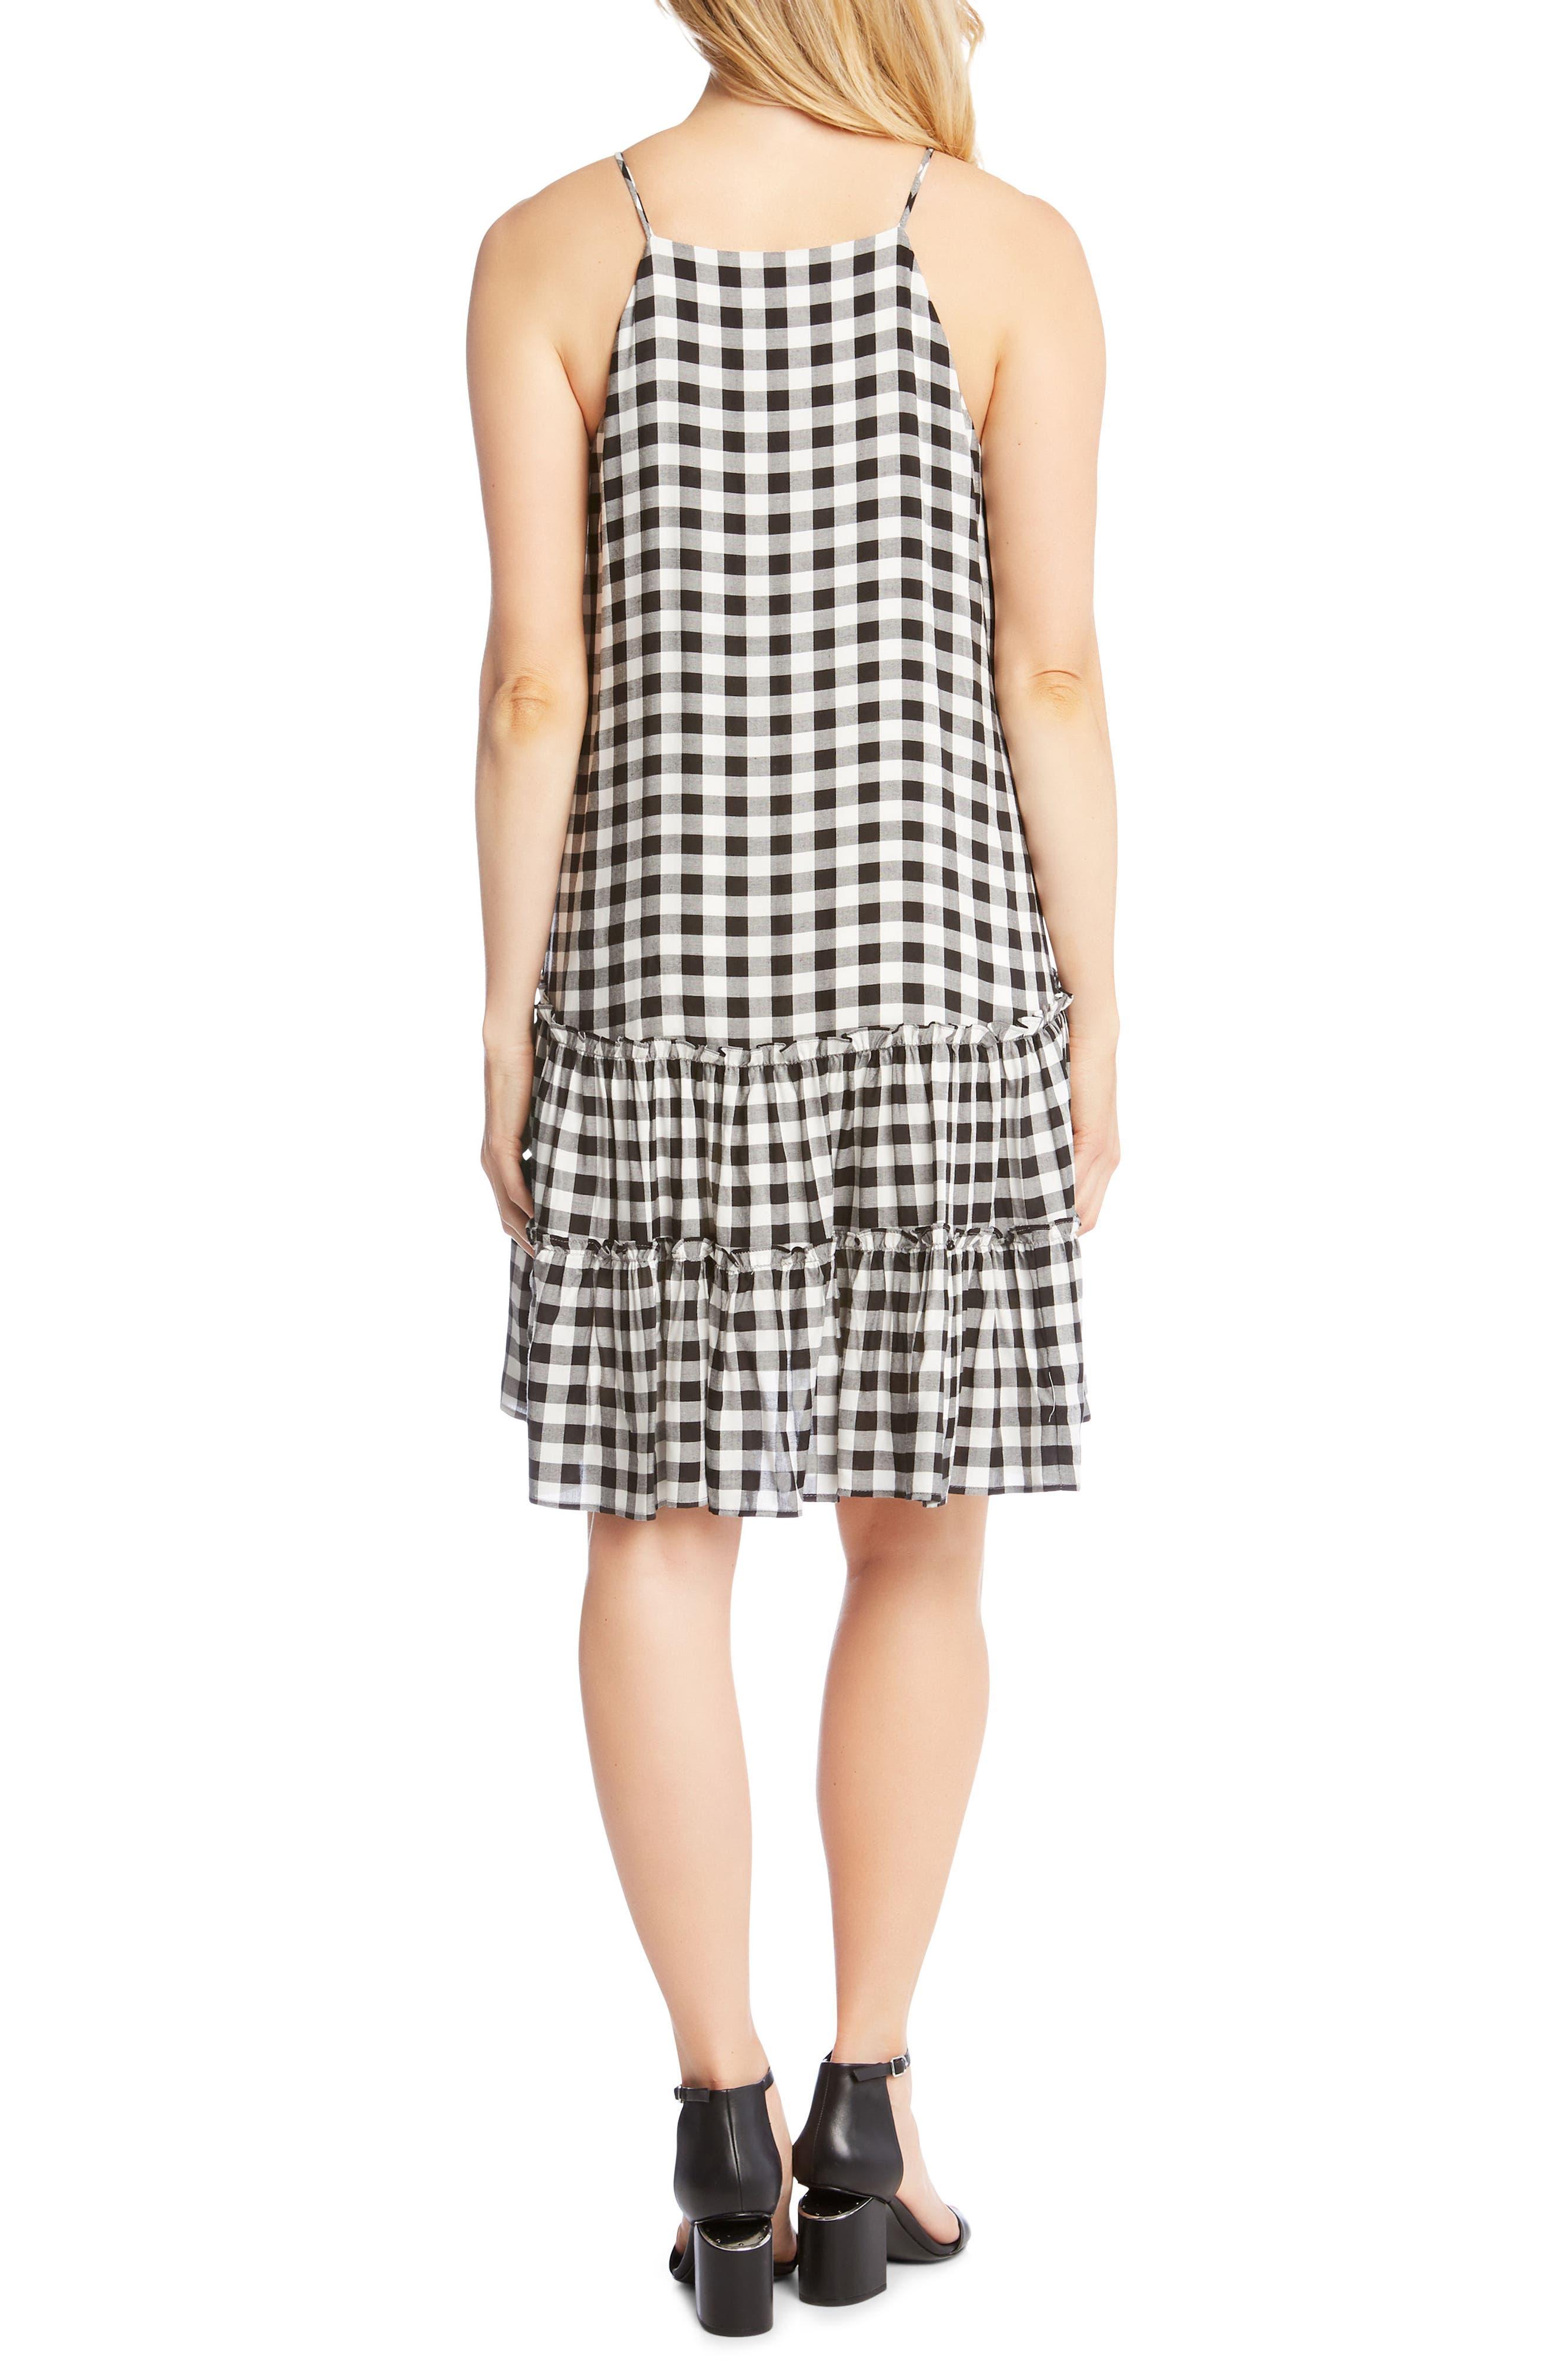 Gingham Ruffle Hem Halter Top Dress,                             Alternate thumbnail 2, color,                             Check